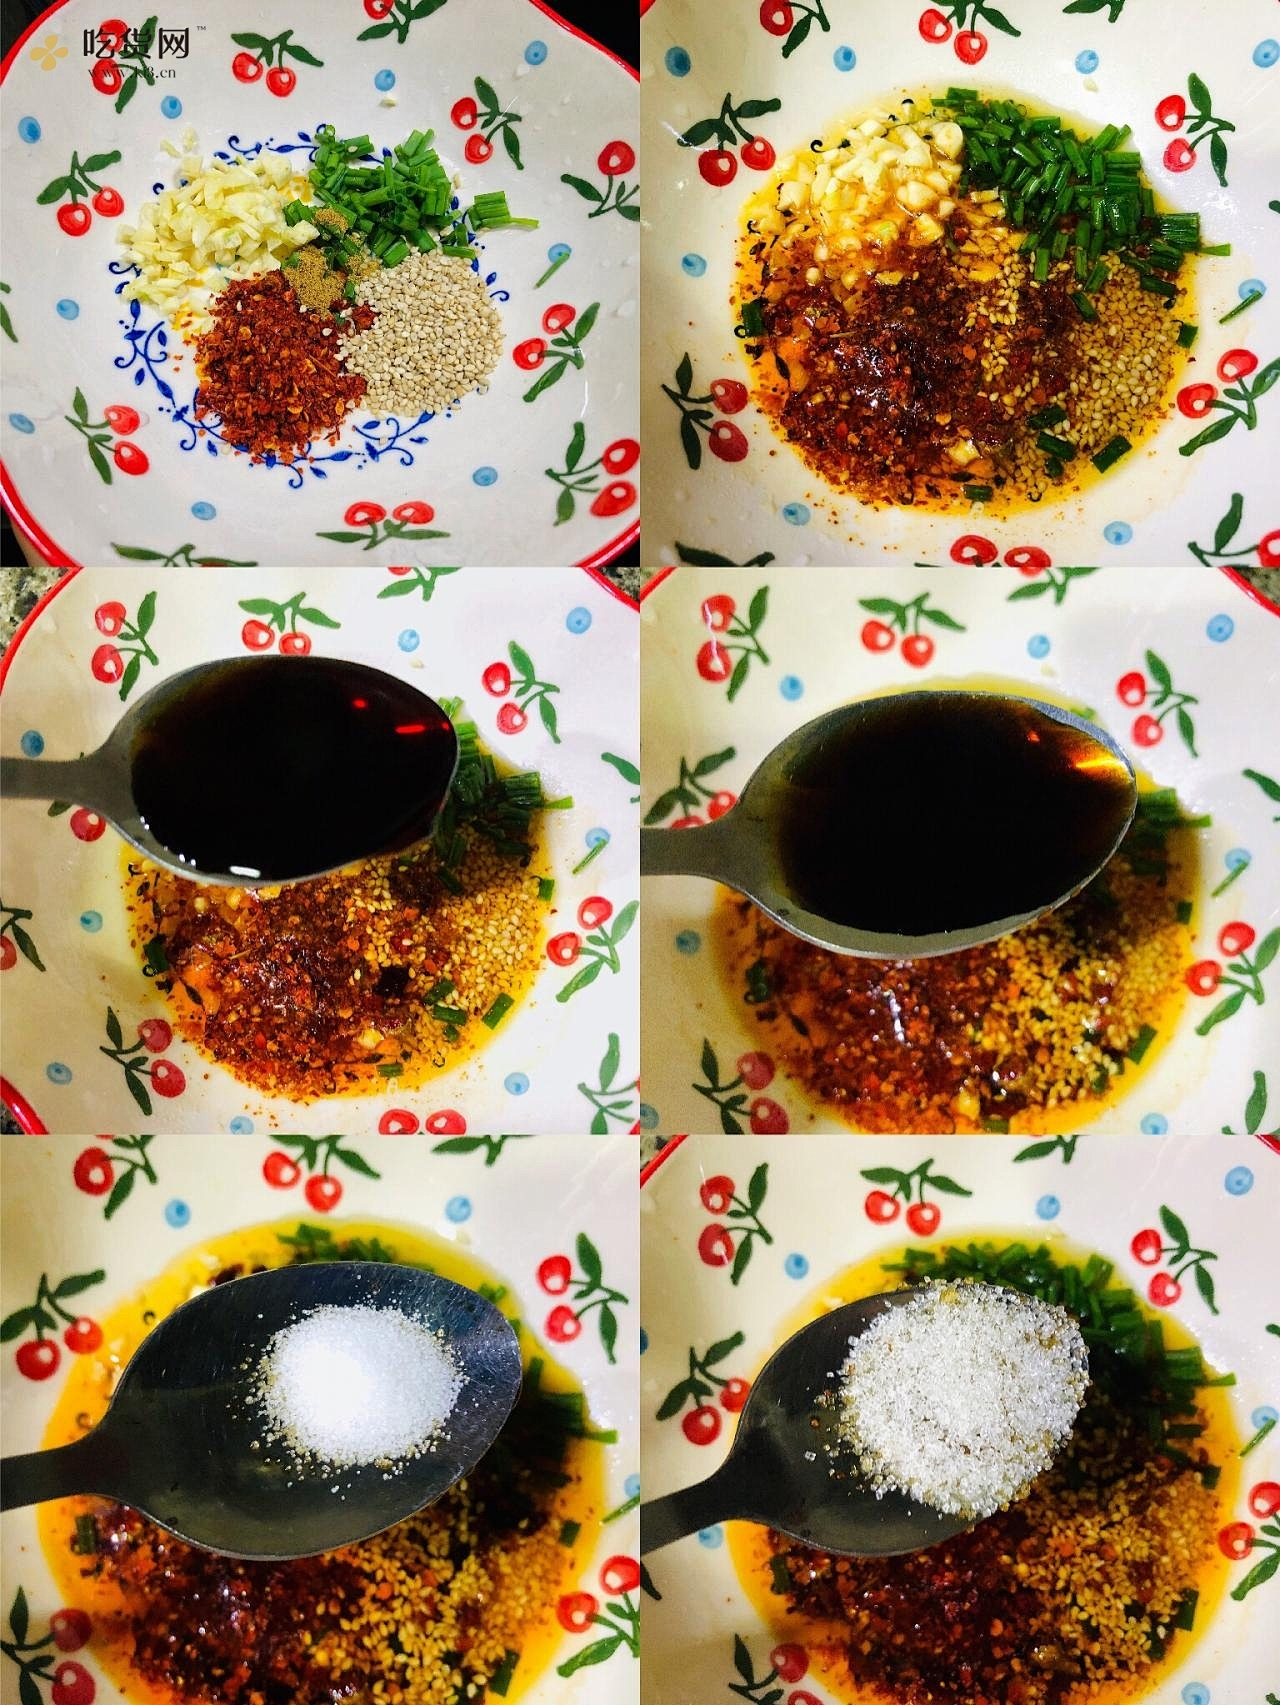 ❗️酸爽开胃㊙️酸辣凉拌面🍜零厨艺食谱的做法 步骤1